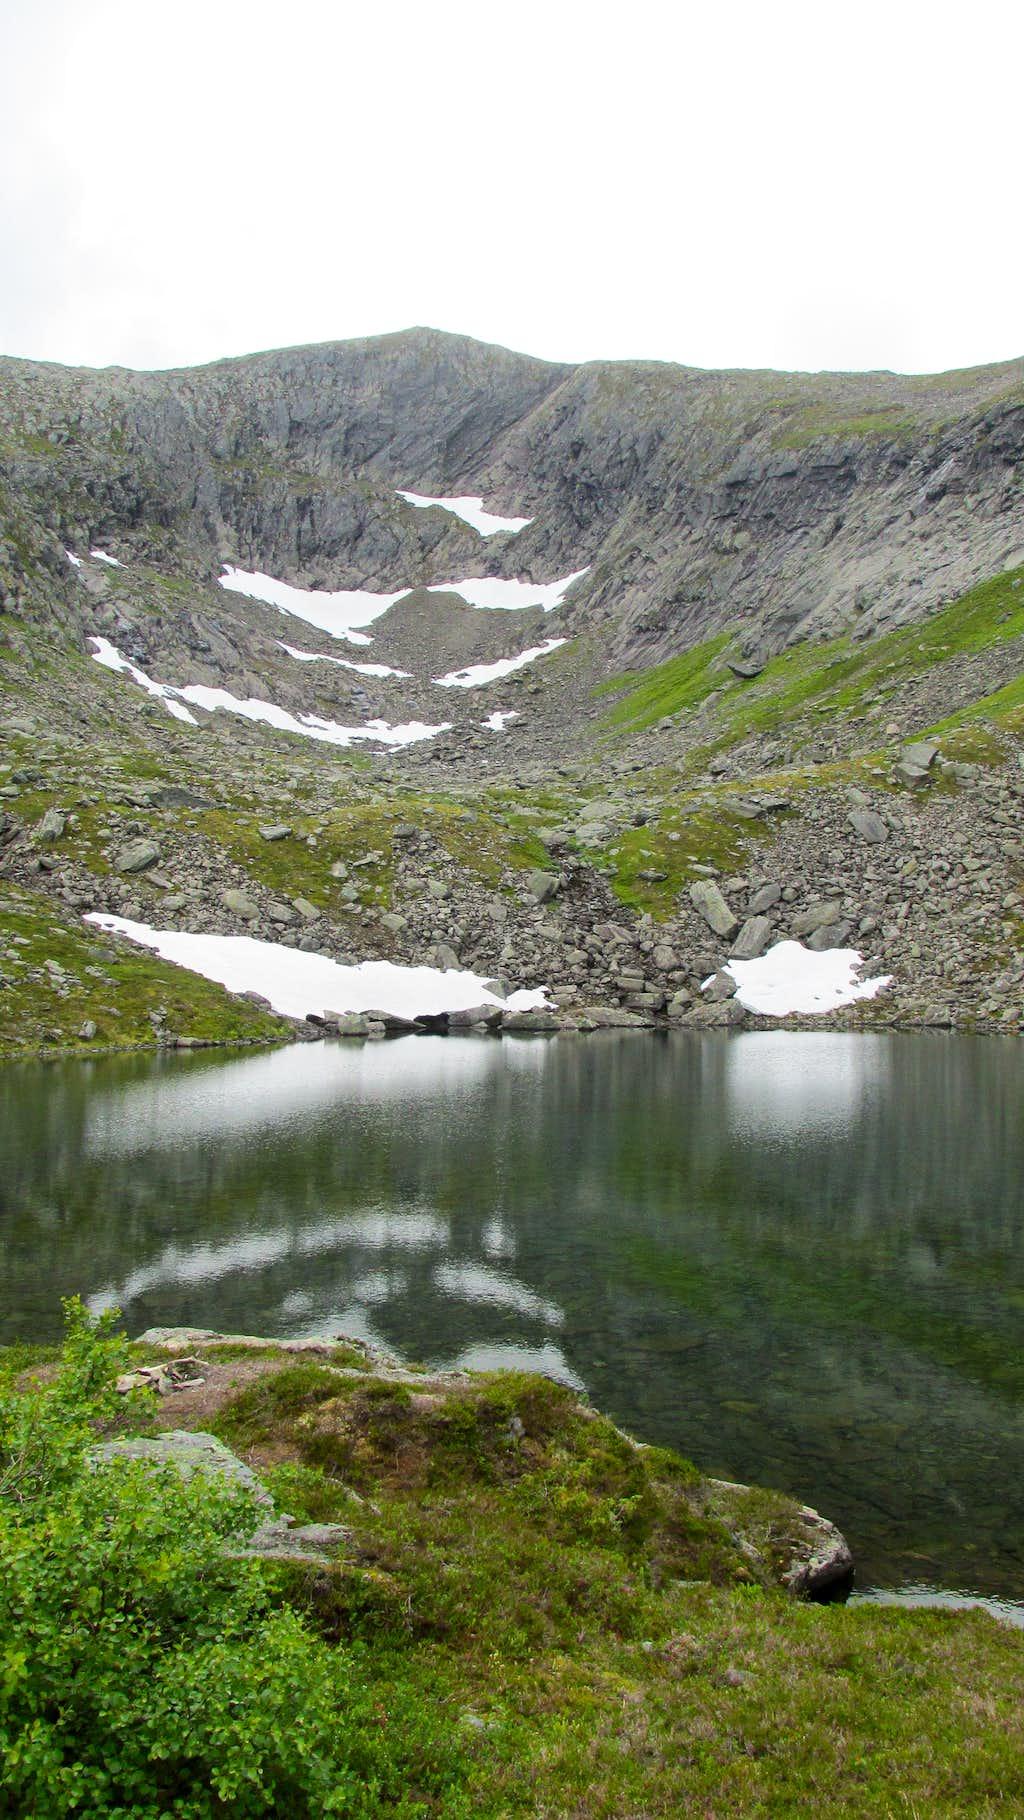 Mjolvafjellet rises behind this pituresque lake